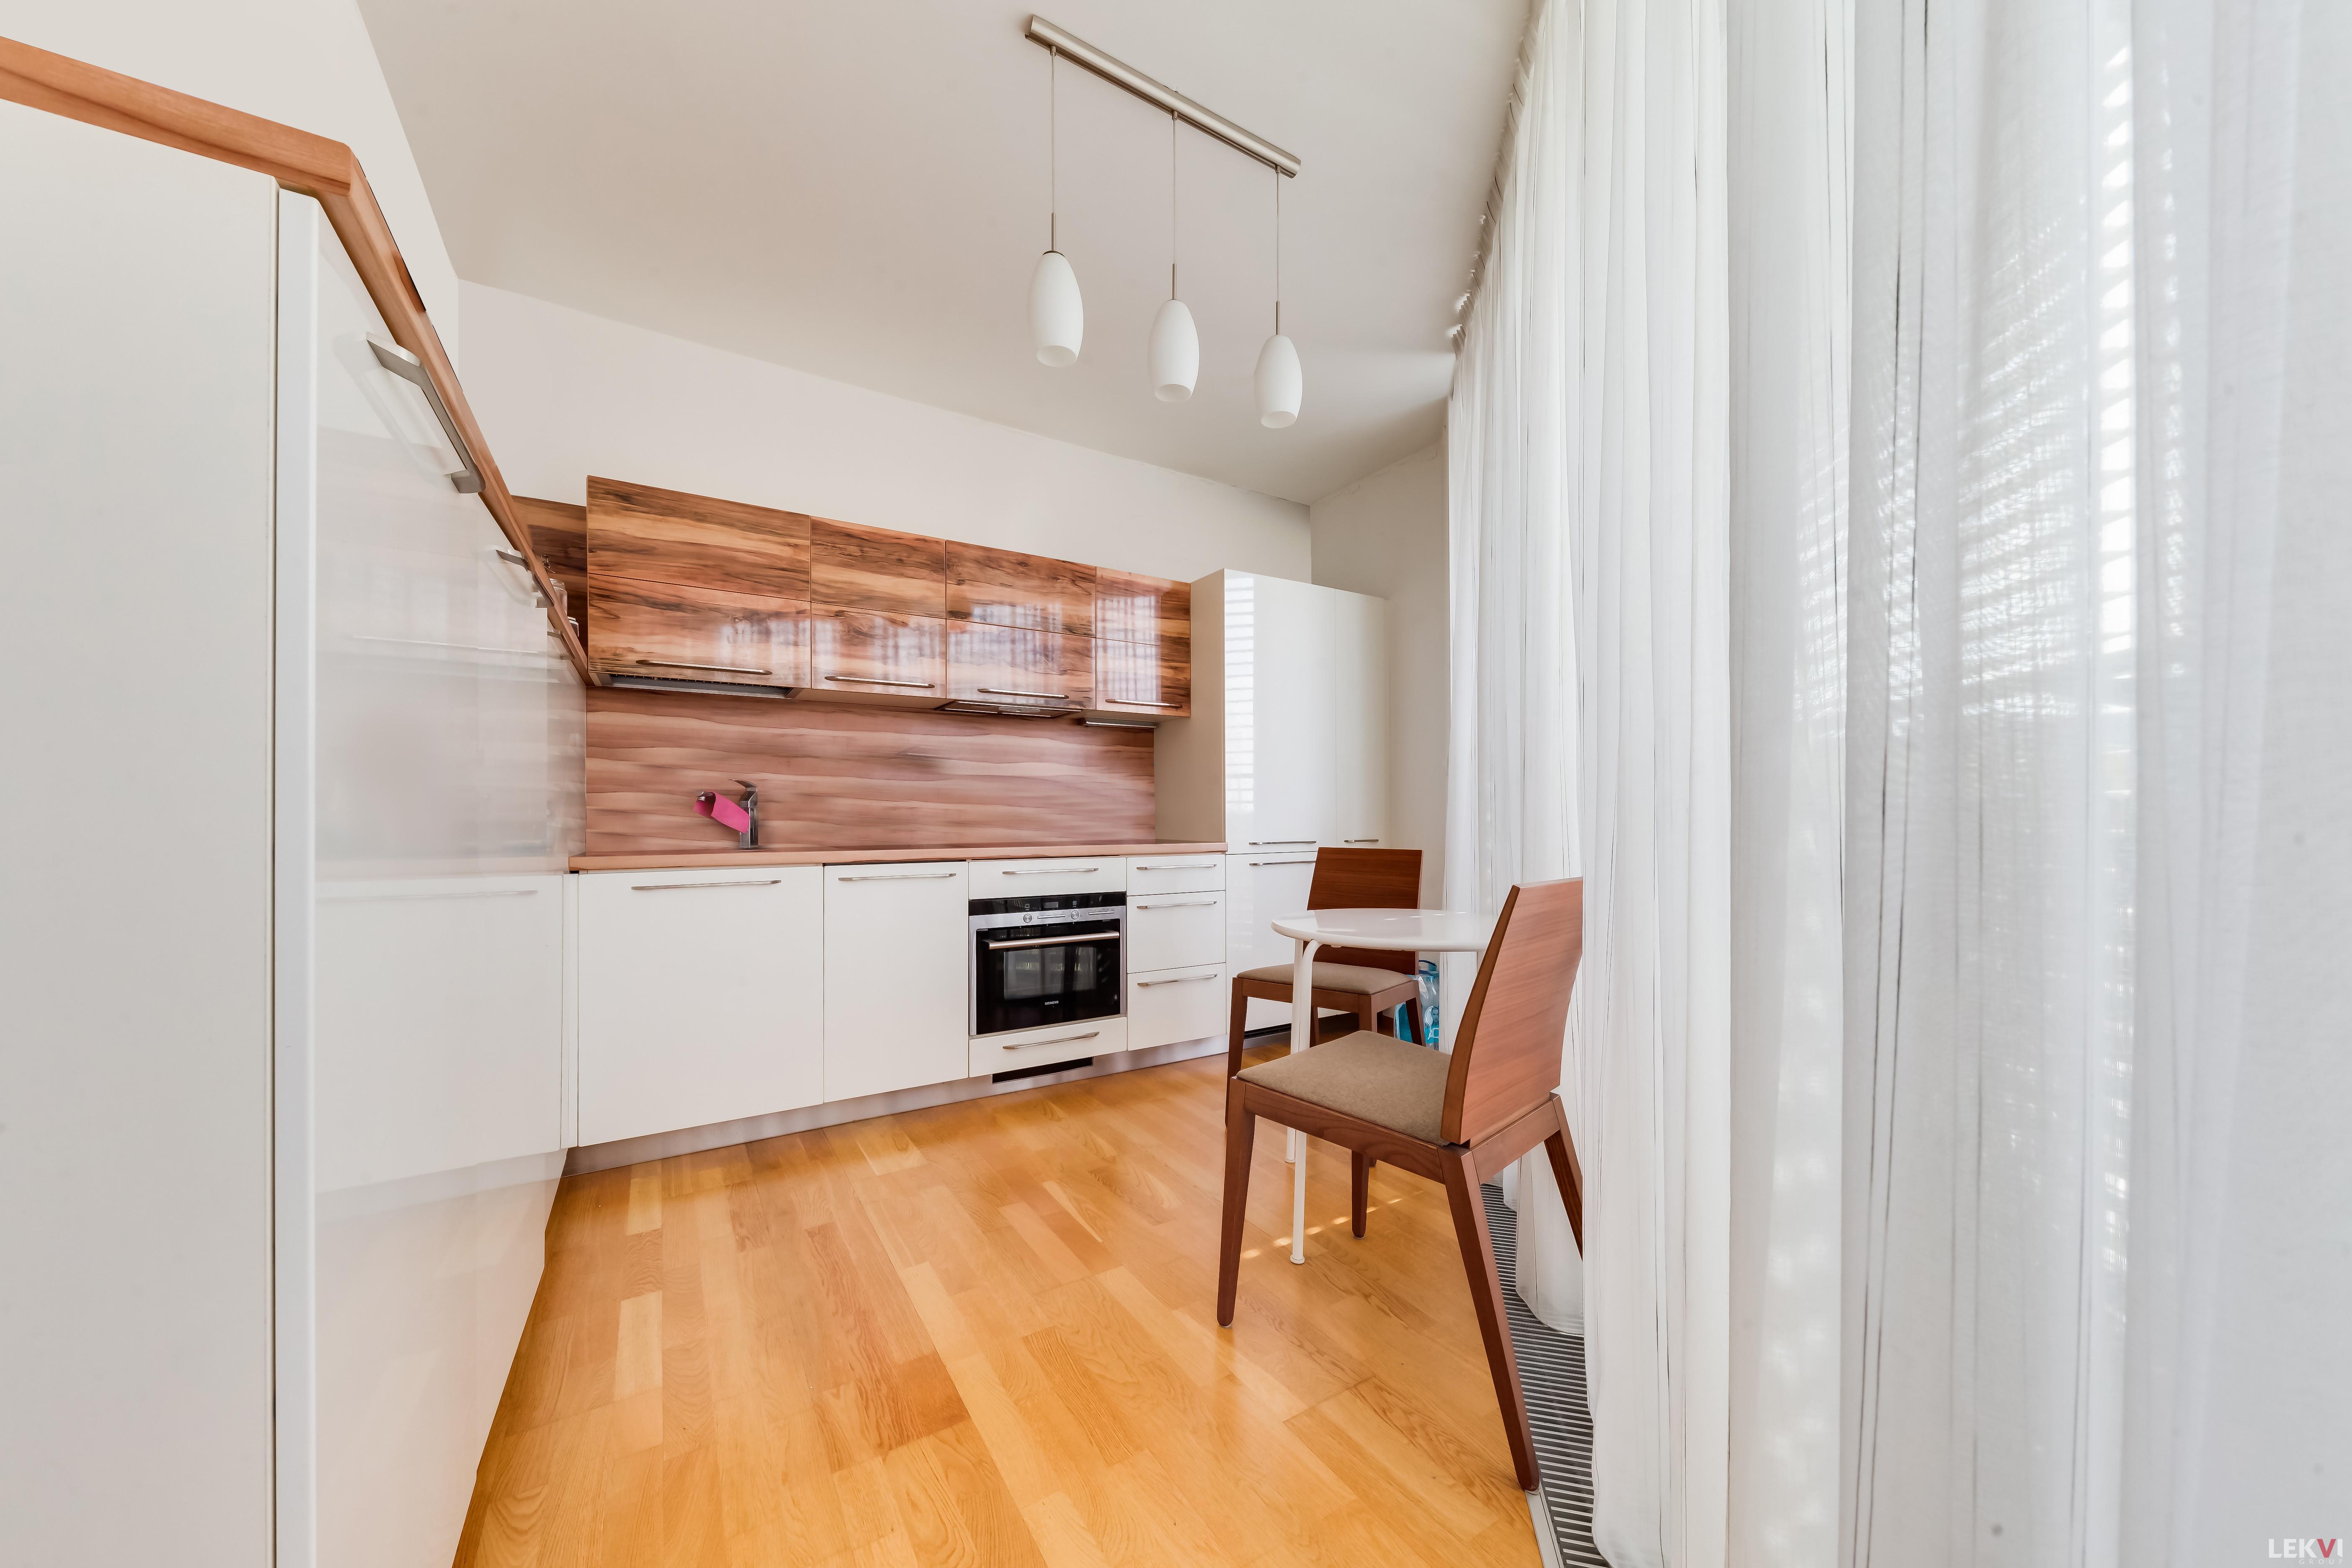 Pronájem bytu 3+kk, 100 m2 - Ke Kapslovně, Praha 3